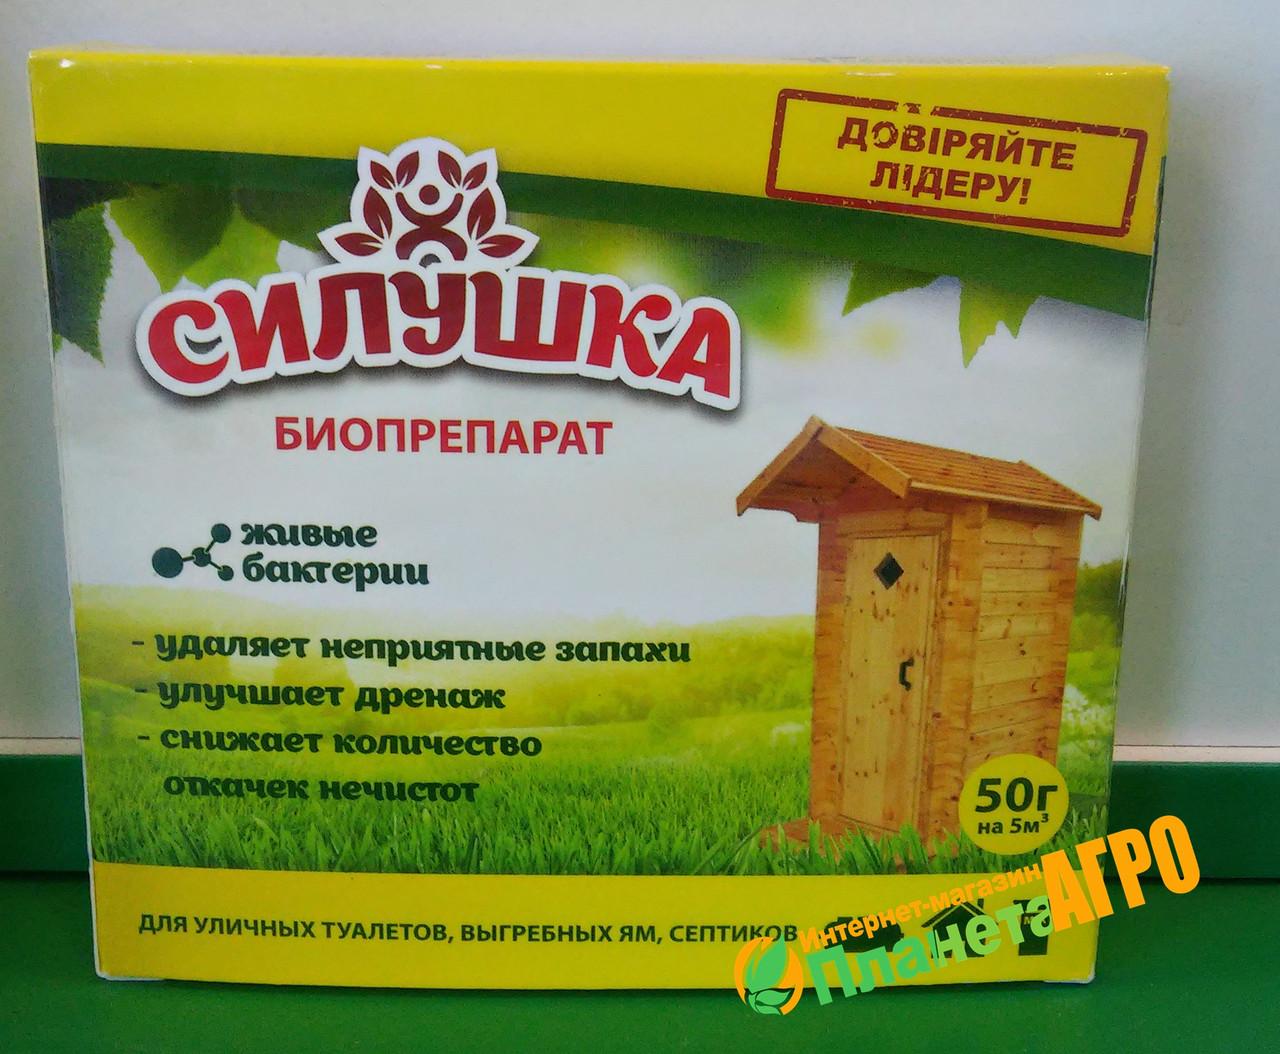 Биопрепарат деструкции  СИЛУШКА 50 г, БиоТехАктив, Украина